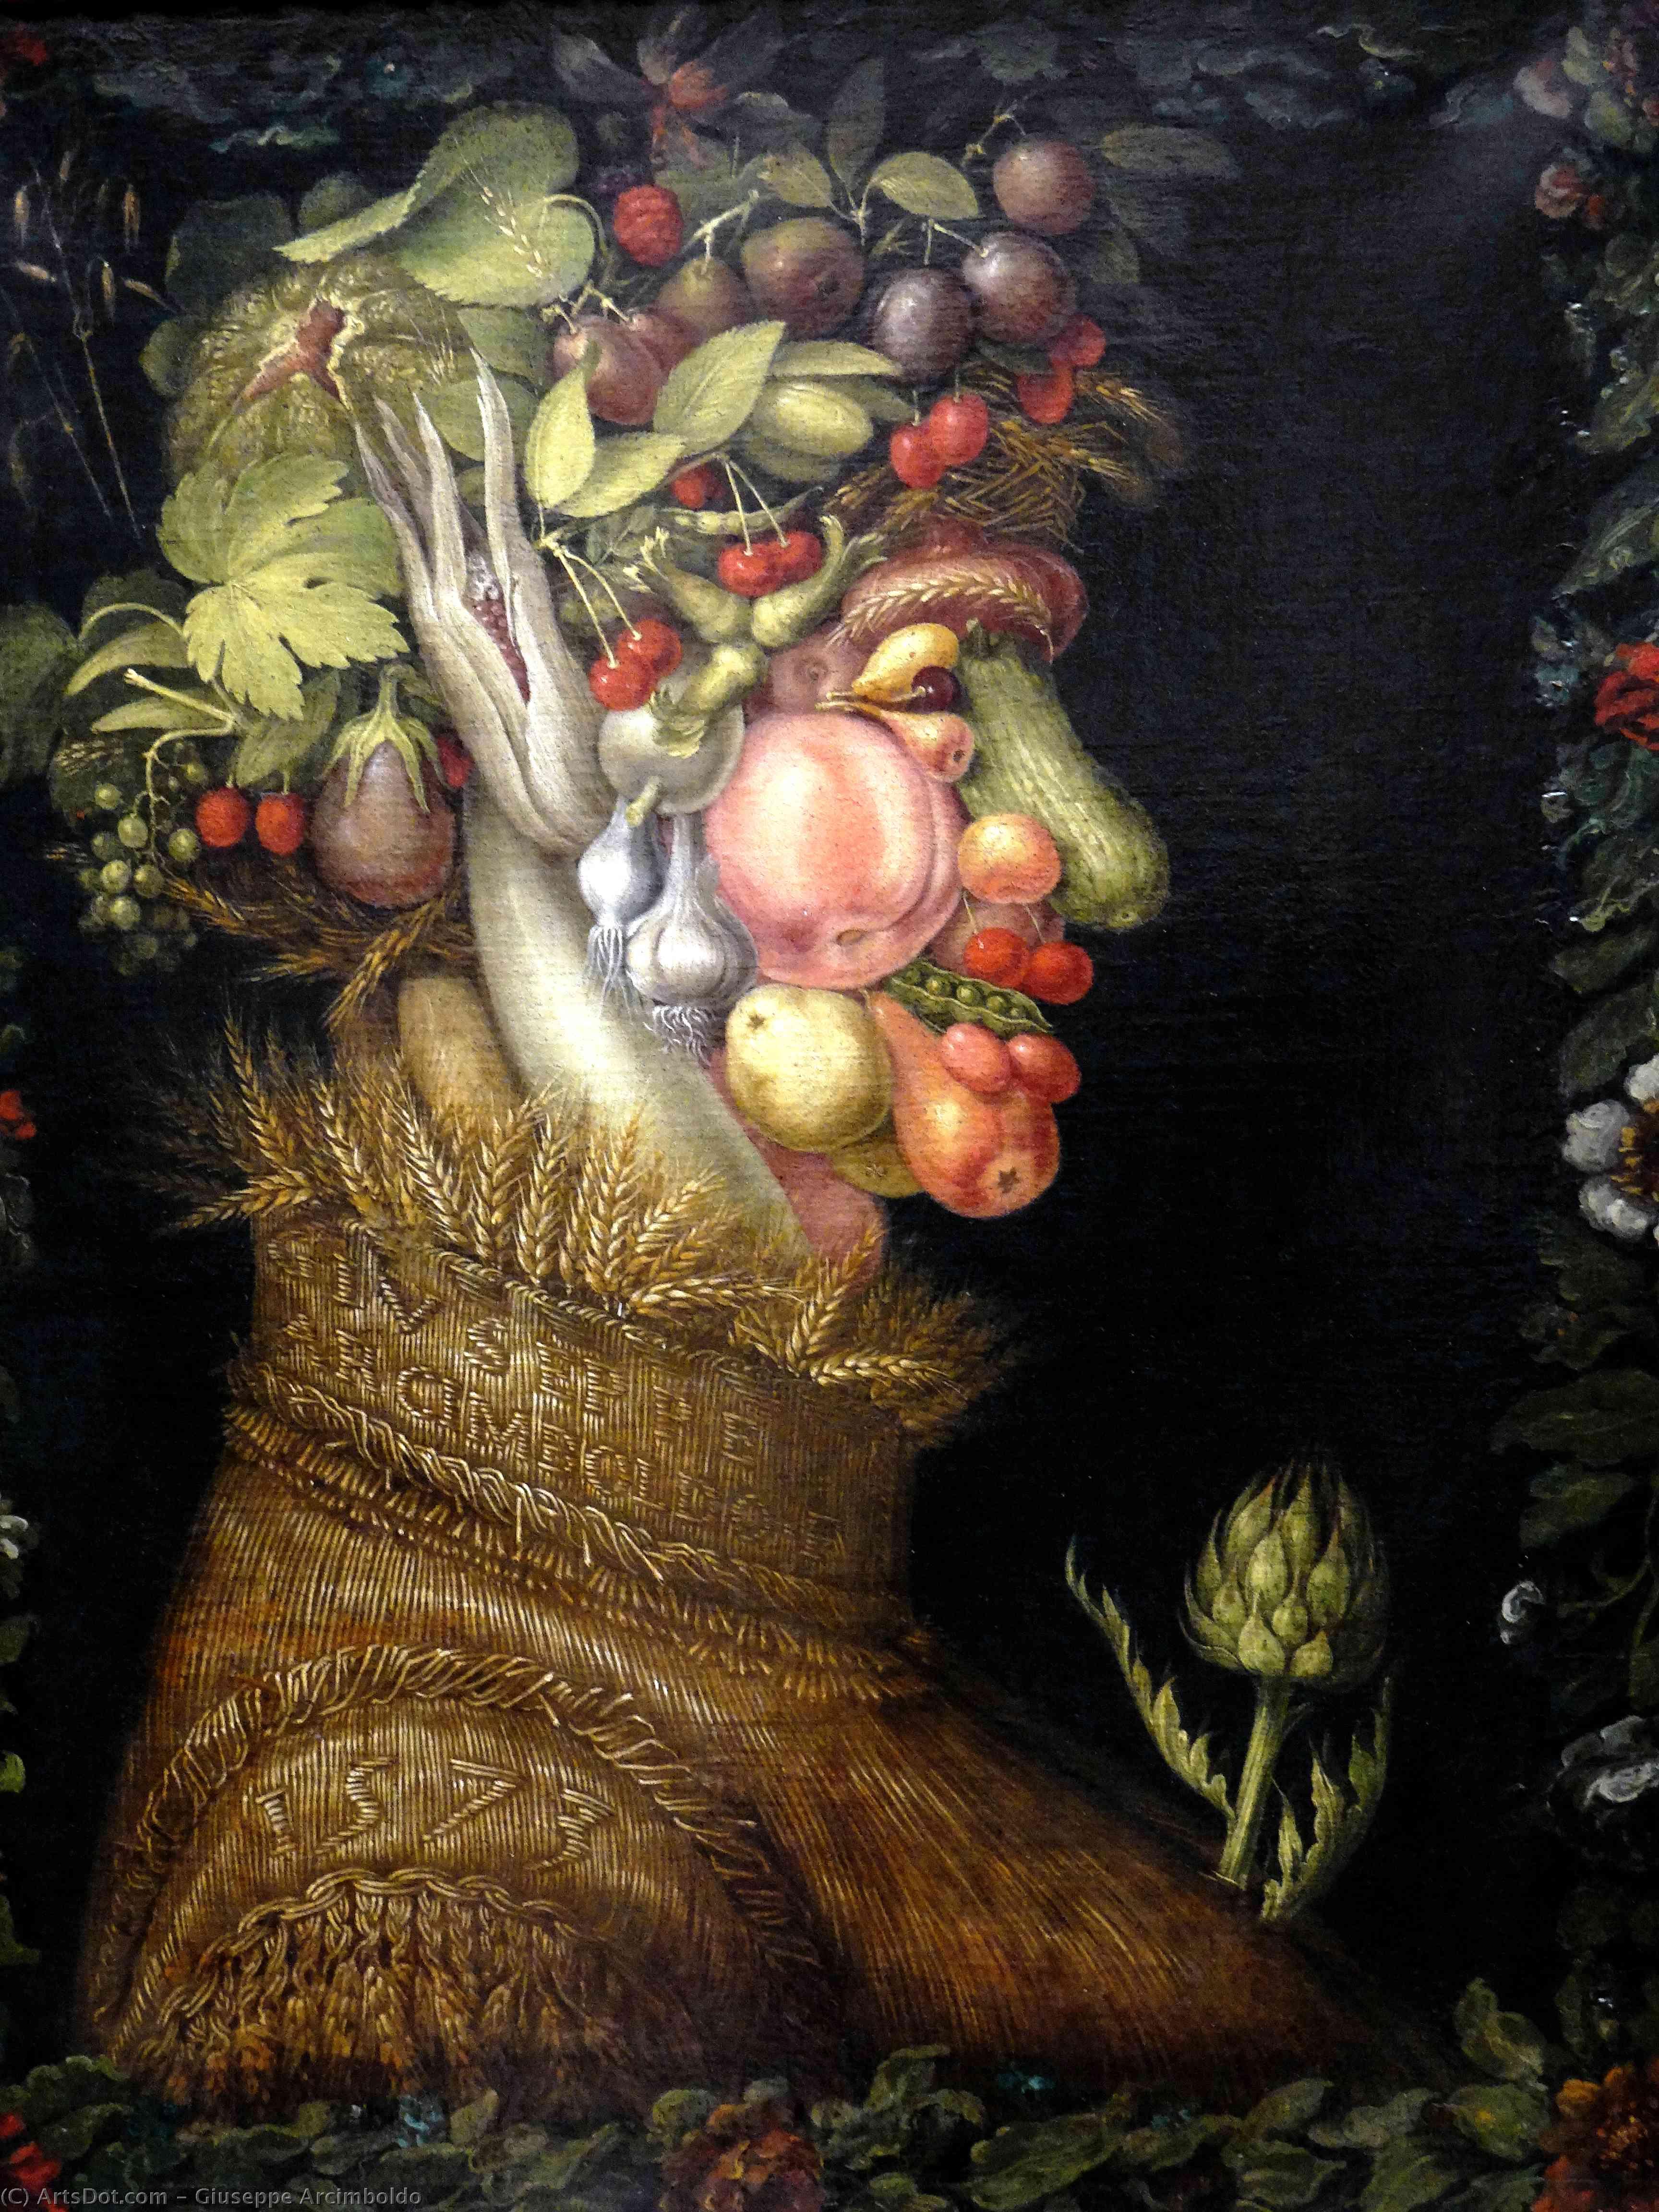 WikiOO.org - Encyclopedia of Fine Arts - Malba, Artwork Giuseppe Arcimboldo - Summer